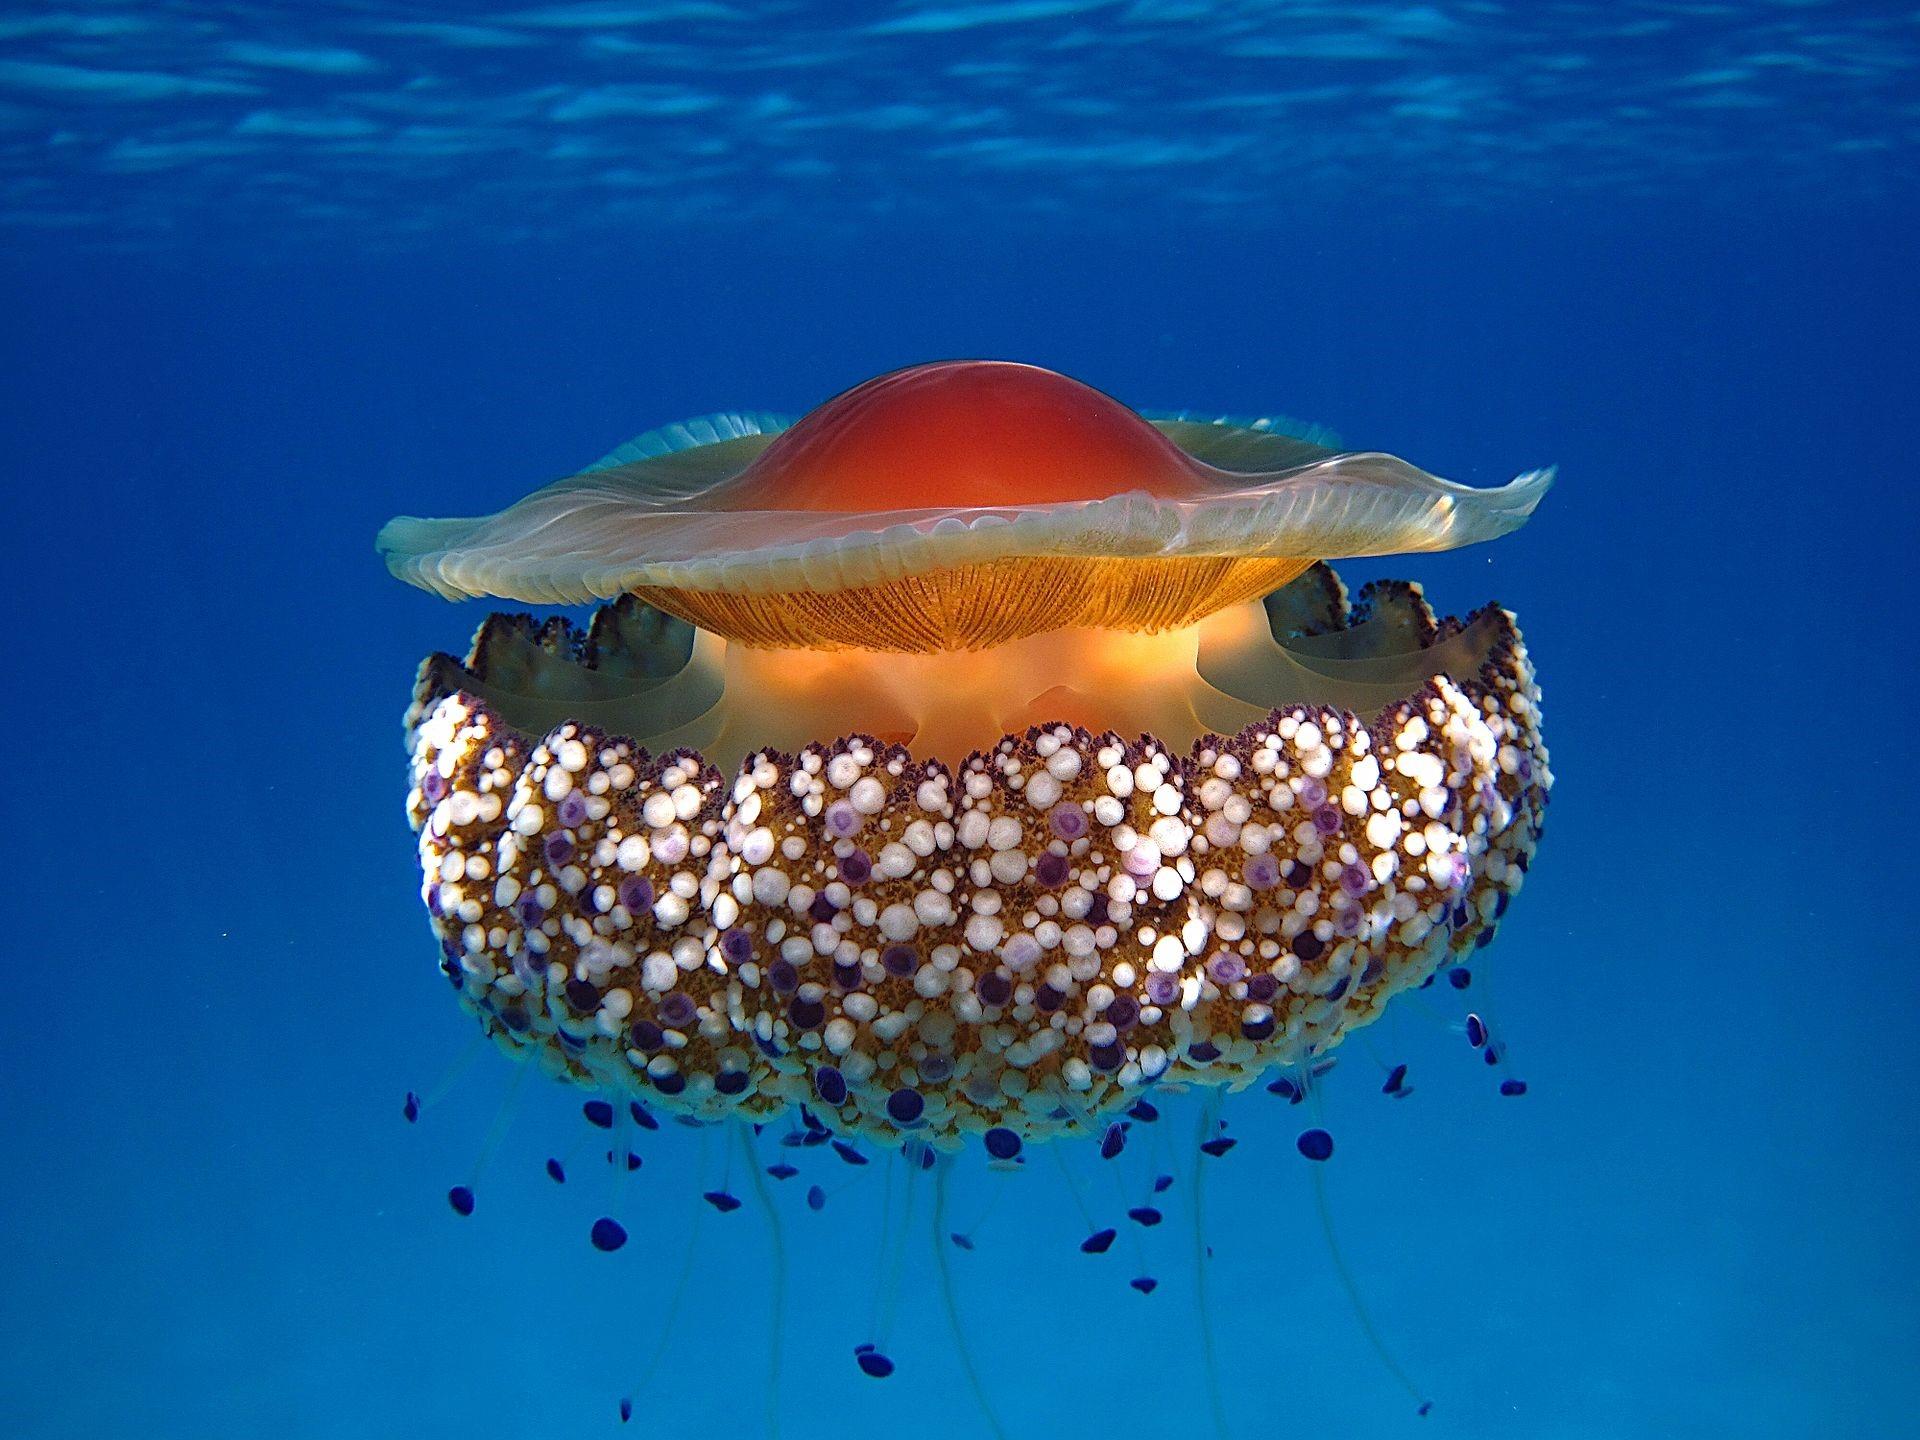 La medusa 'Cotylorhiza tuberculata' ha registrado proliferaciones masivas en el Mar Menor. Imagen: Wikipedia / CSIC